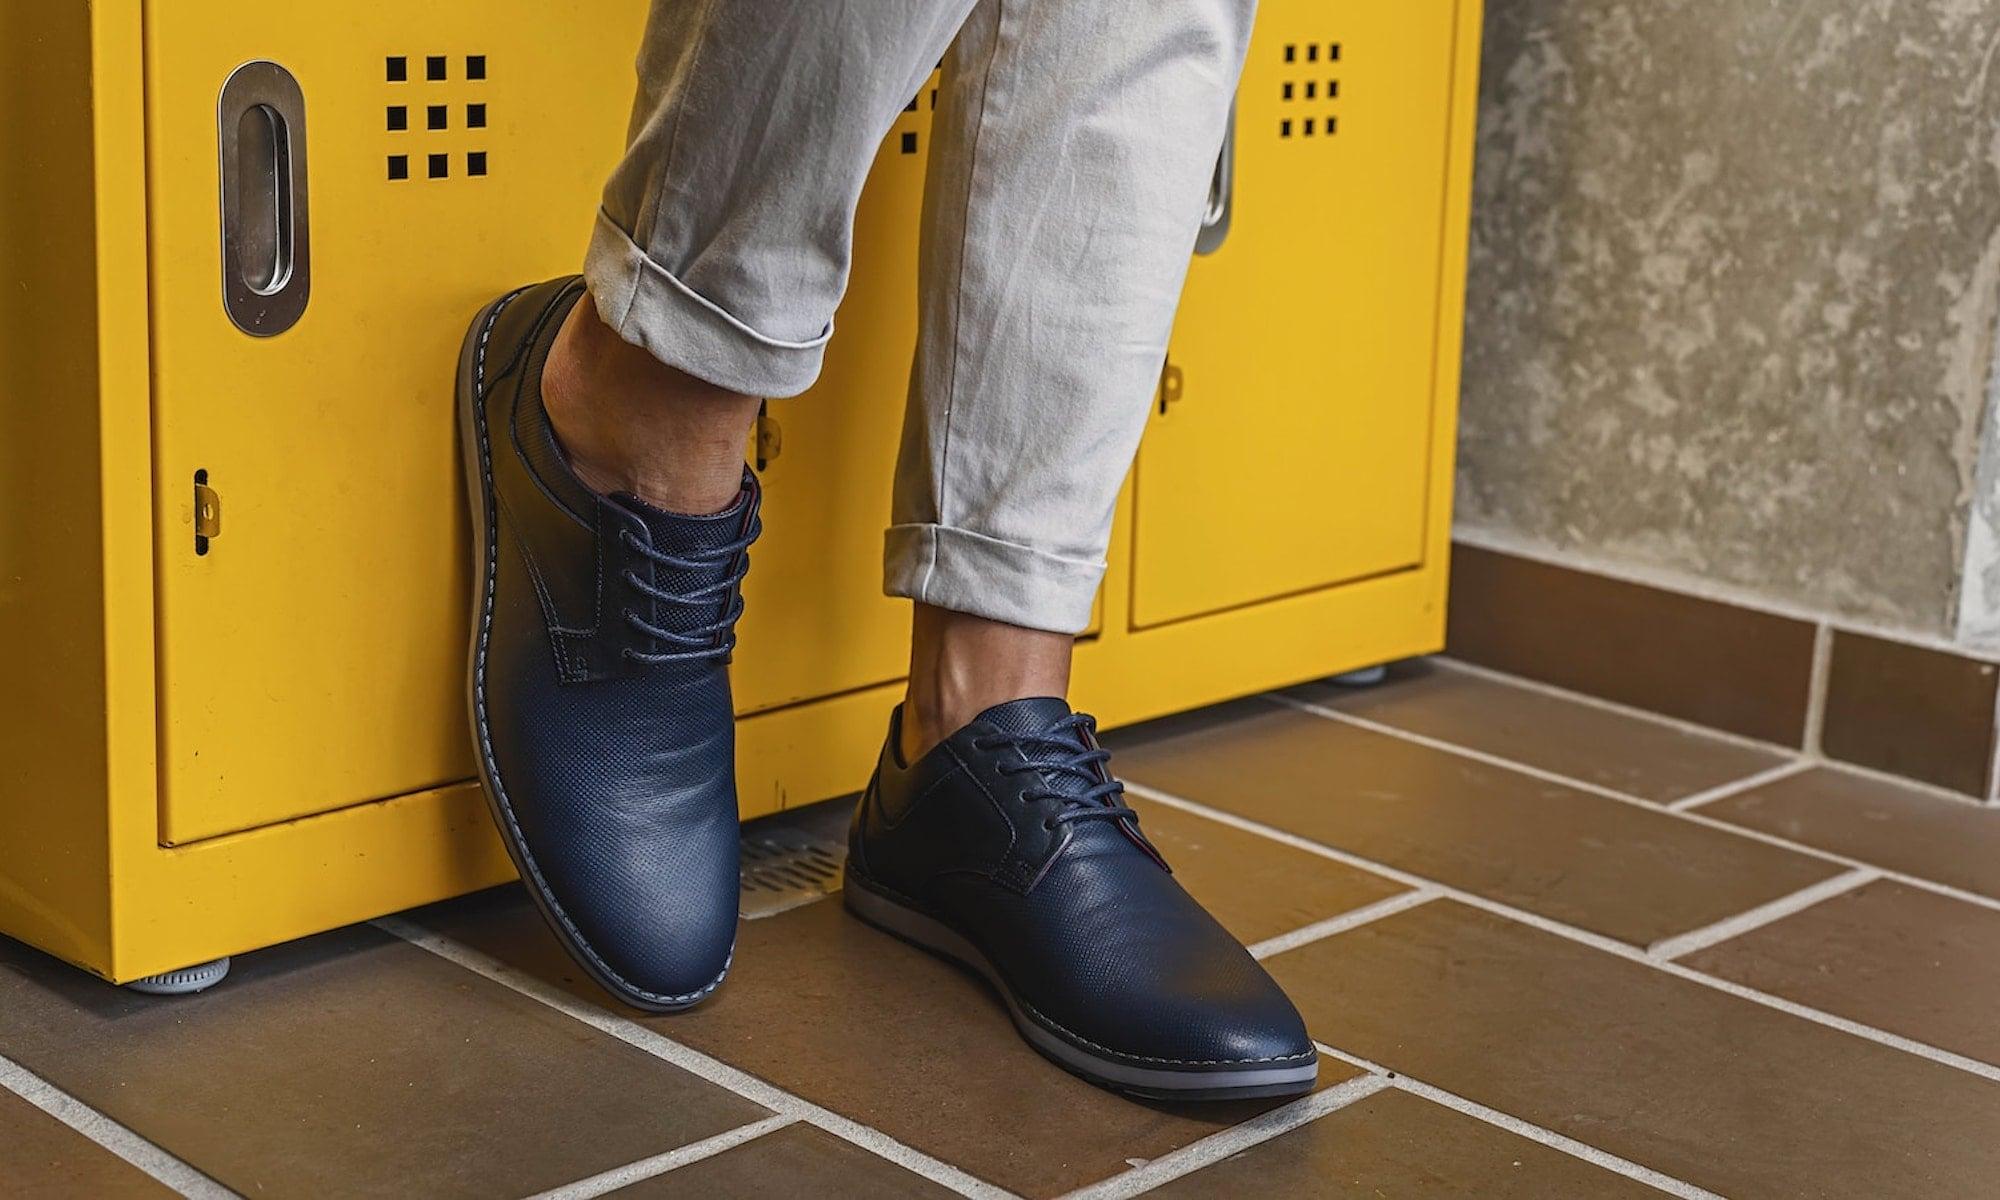 John-Candor-Shoes-cross-occasional-footwear-01-1.jpeg